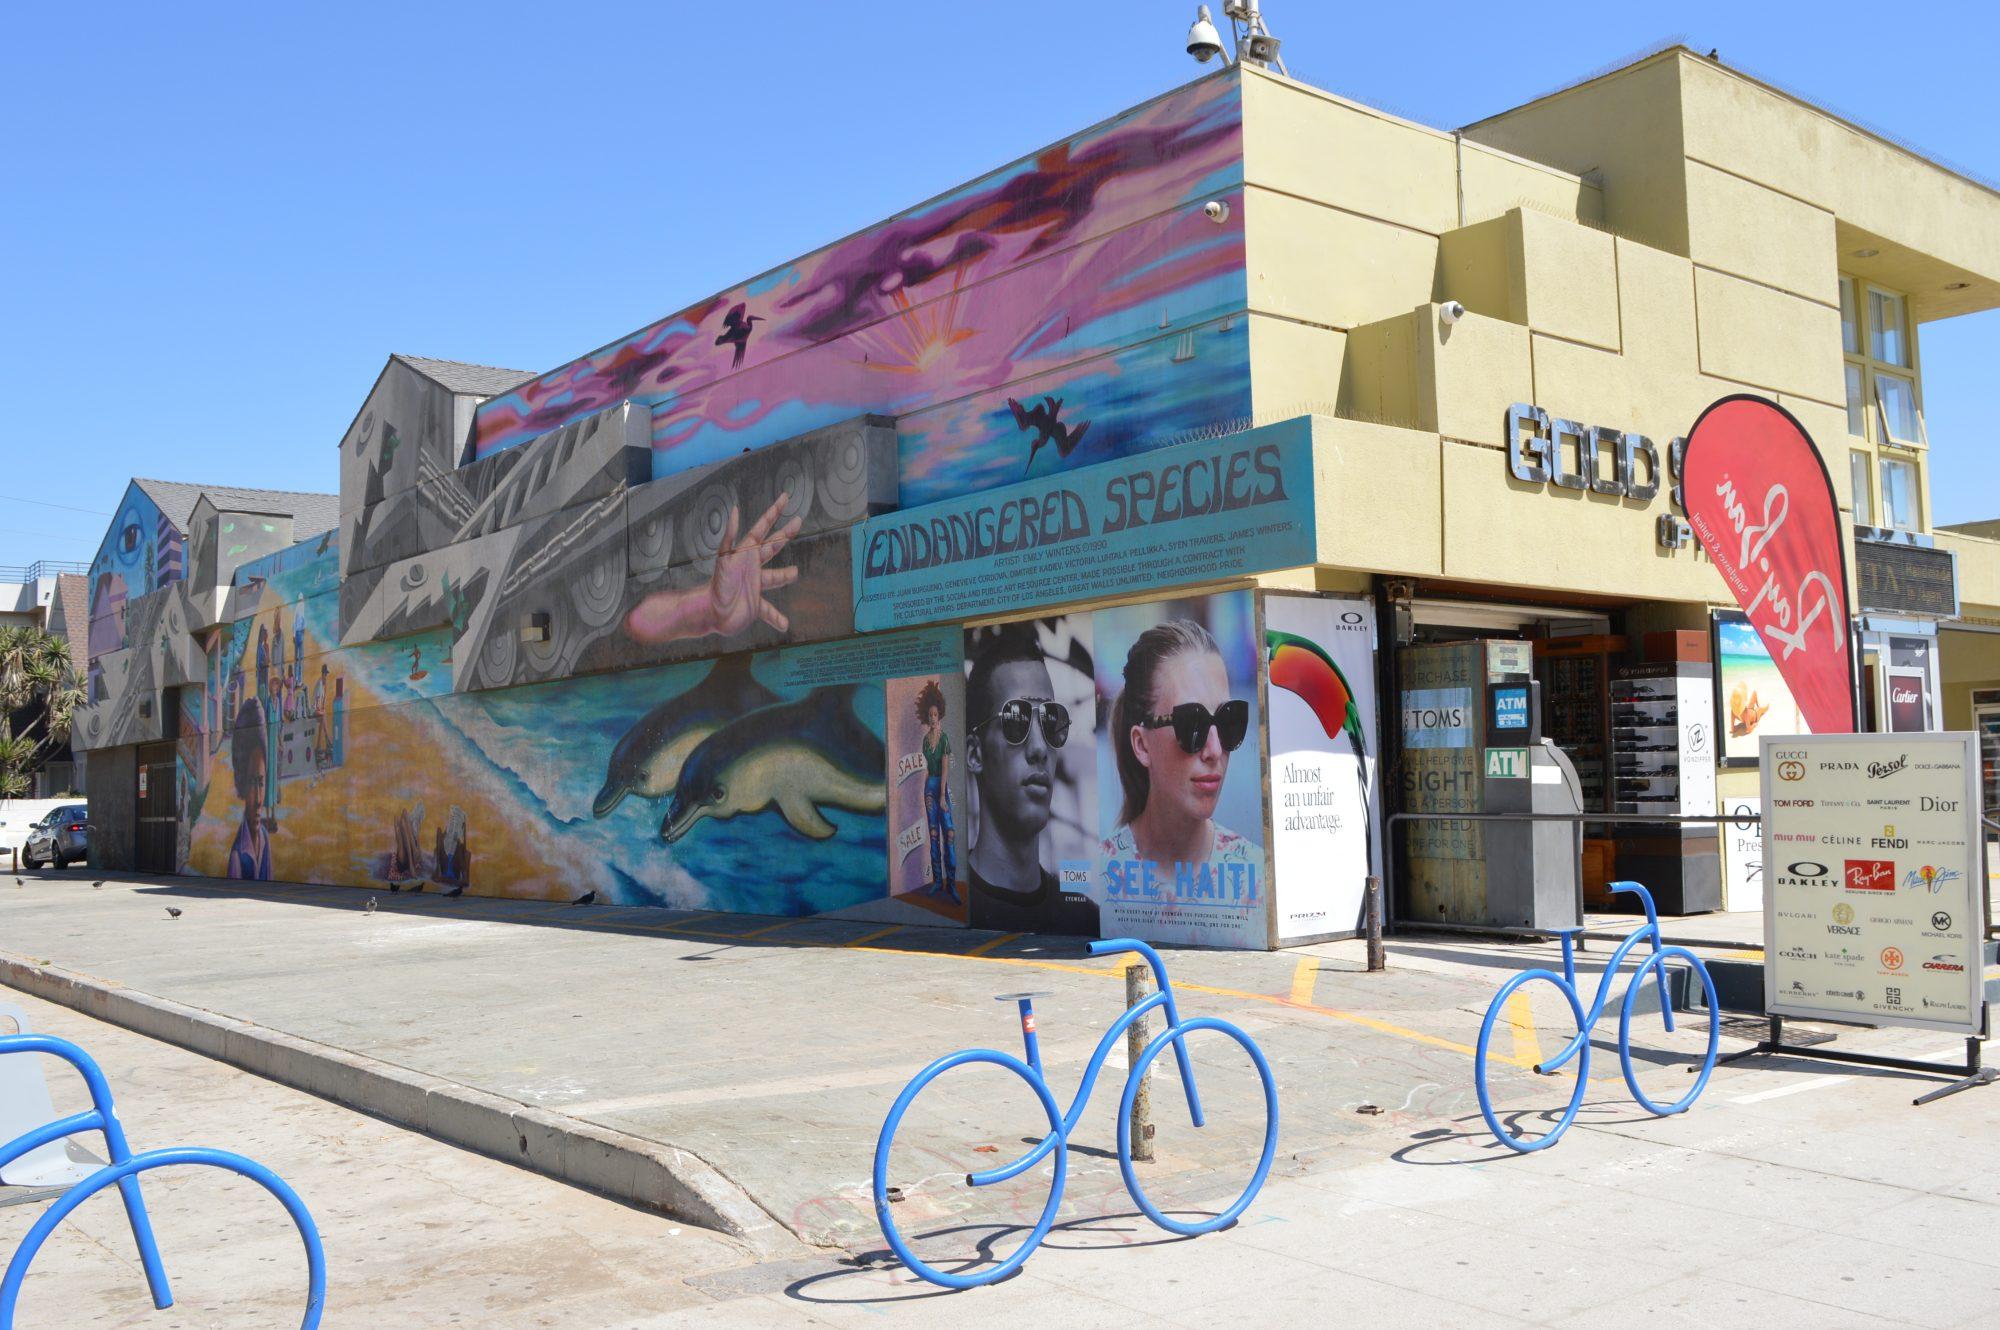 Street art in Venice California